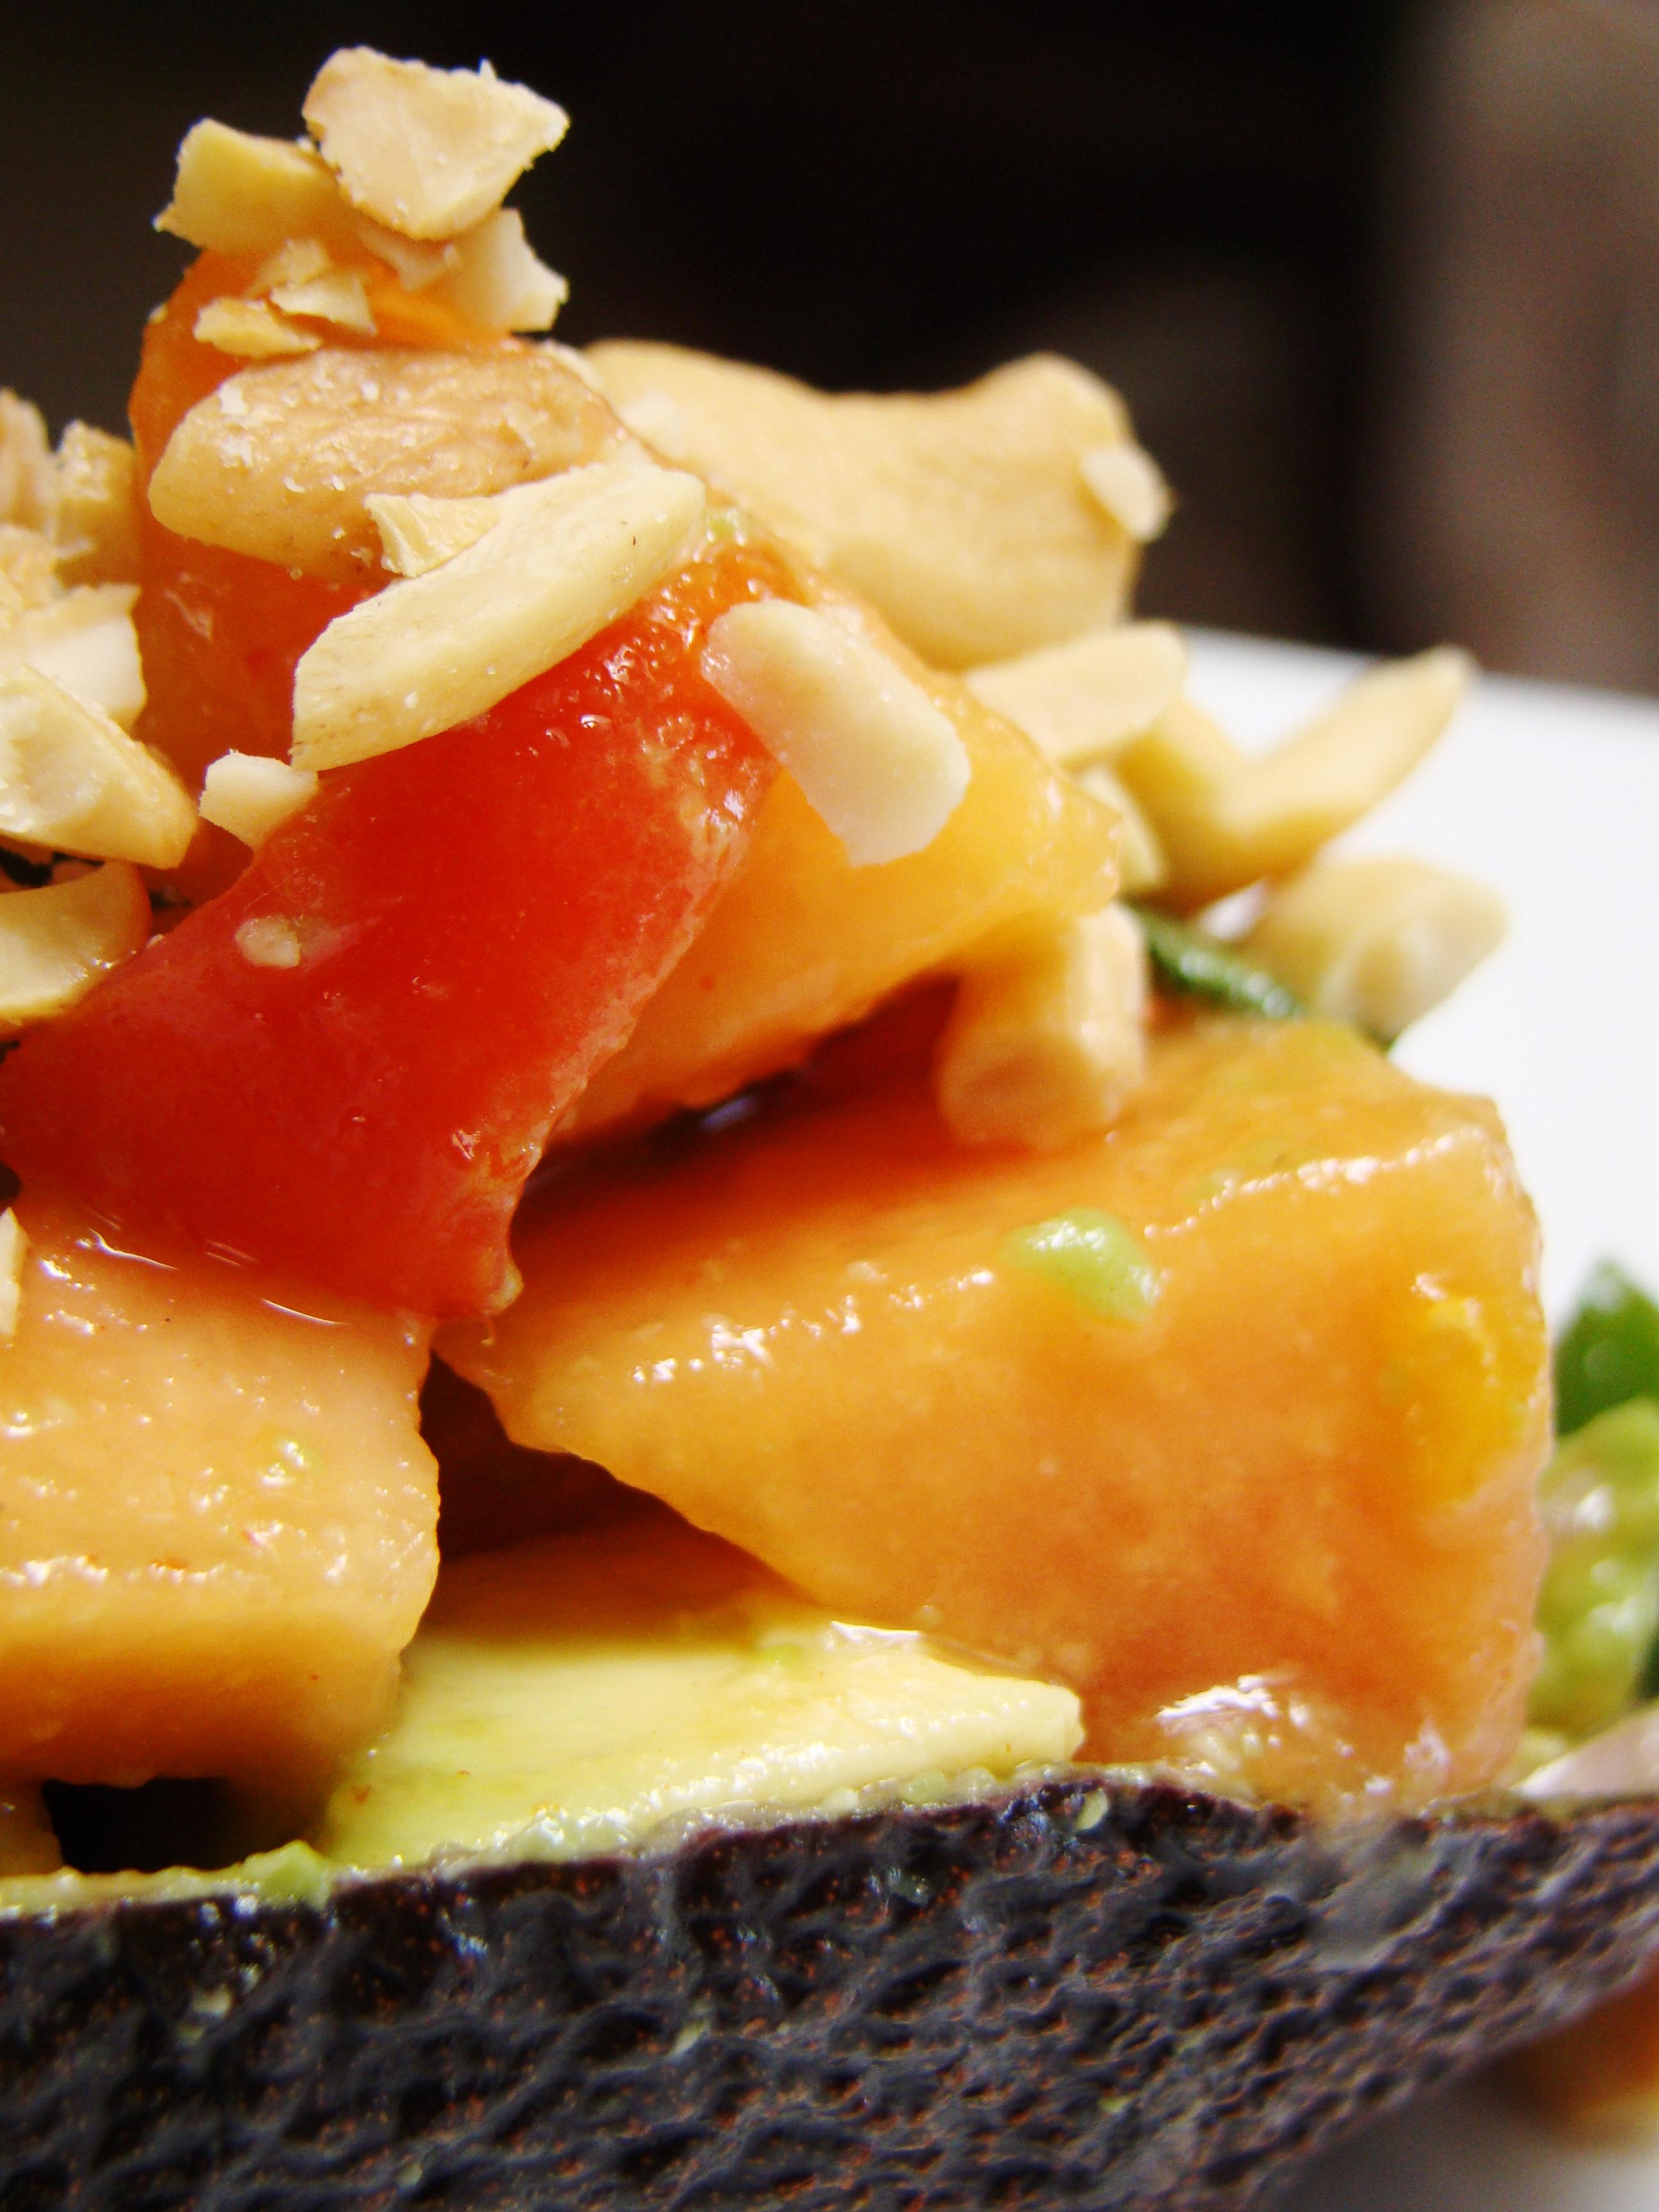 File:Avocado Papaya Salad (4467442543).jpg - Wikimedia Commons